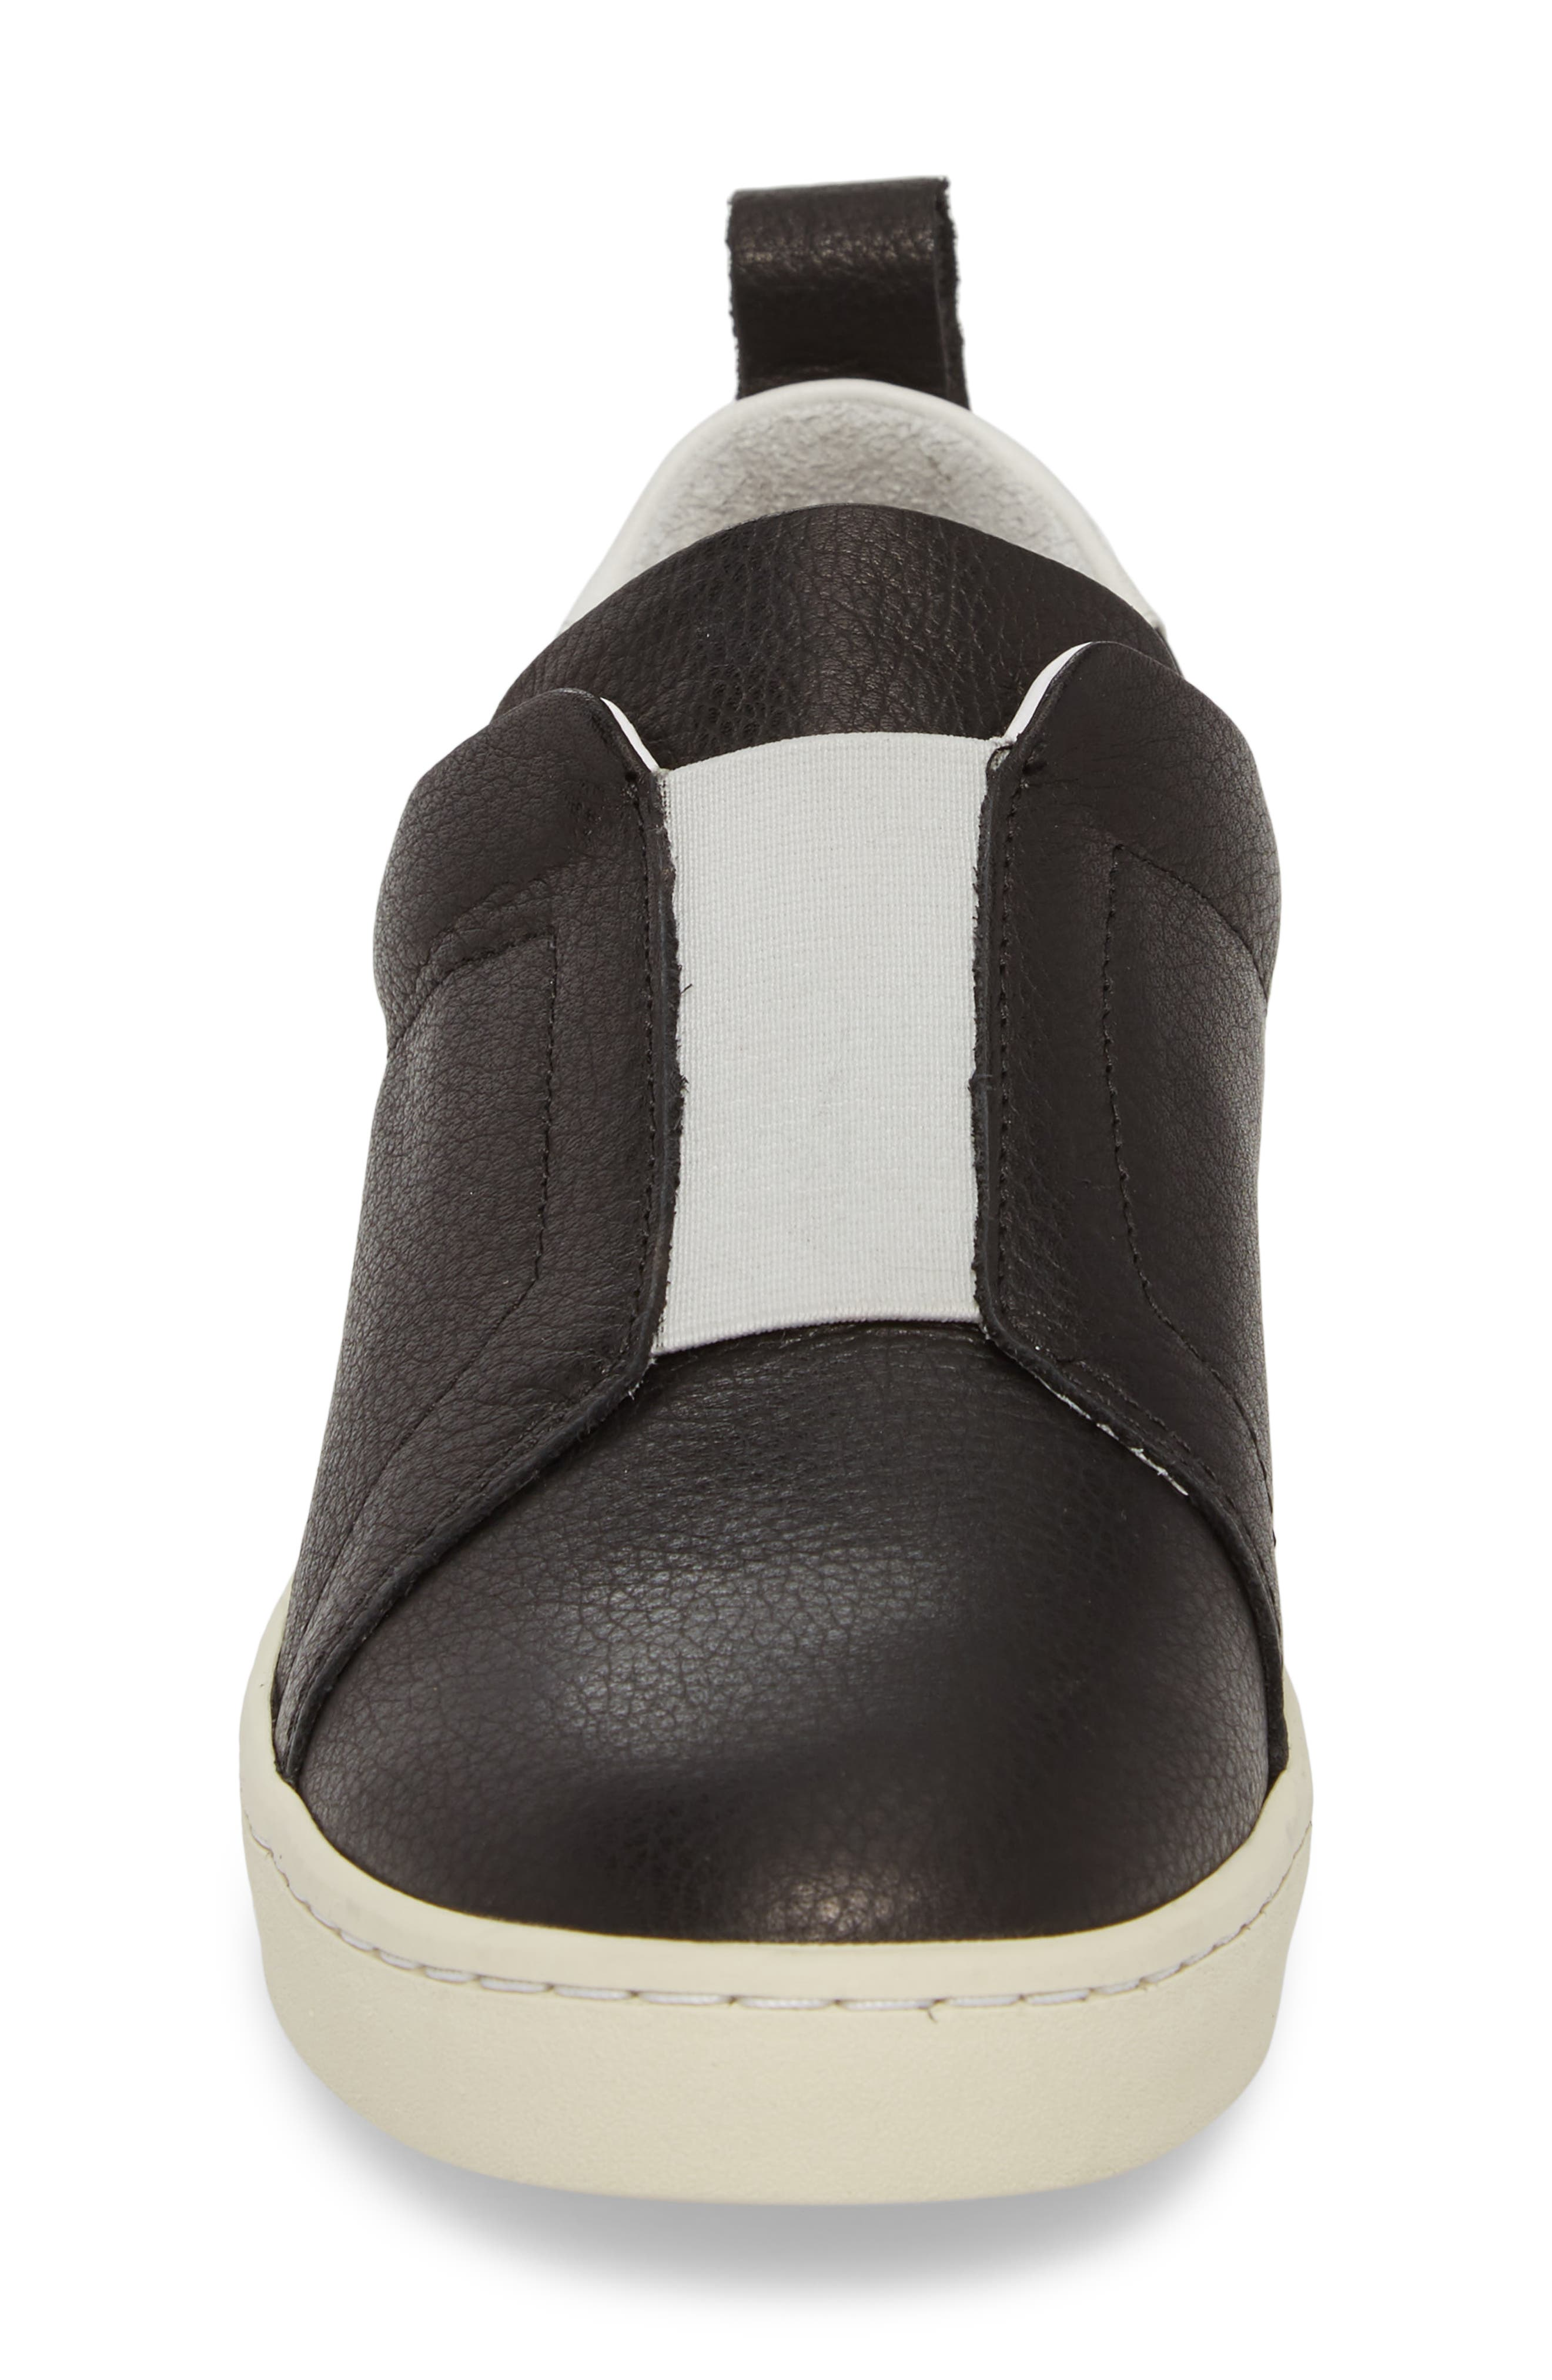 Mutt Slip-On Sneaker,                             Alternate thumbnail 4, color,                             BLACK BRITO LEATHER